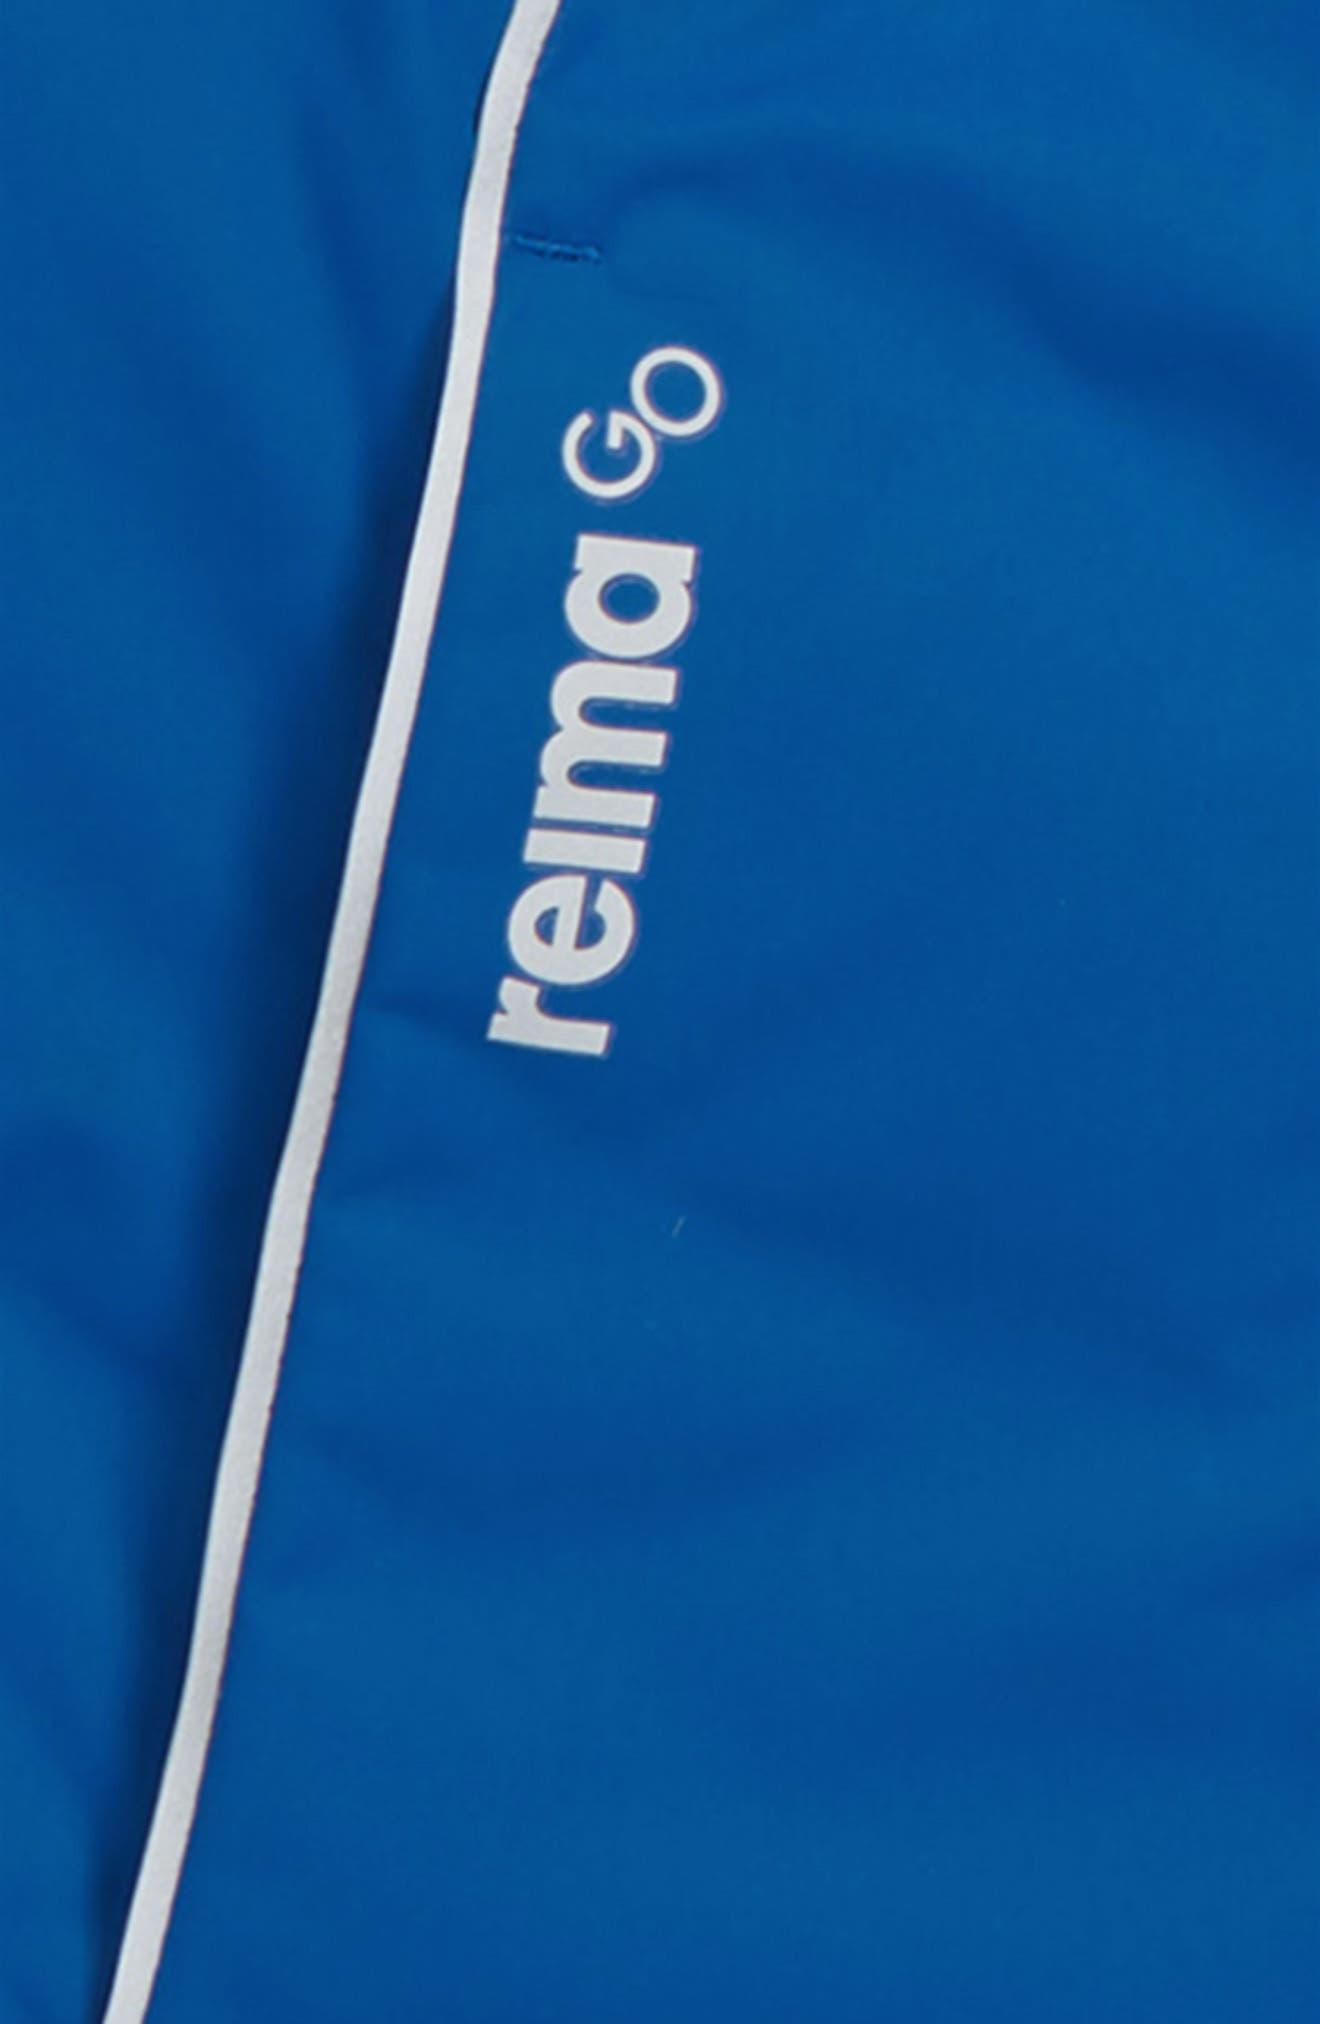 Brisk Reimatec<sup>®</sup> 3-in-1 Windproof & Waterproof Jacket,                             Alternate thumbnail 2, color,                             BLUE